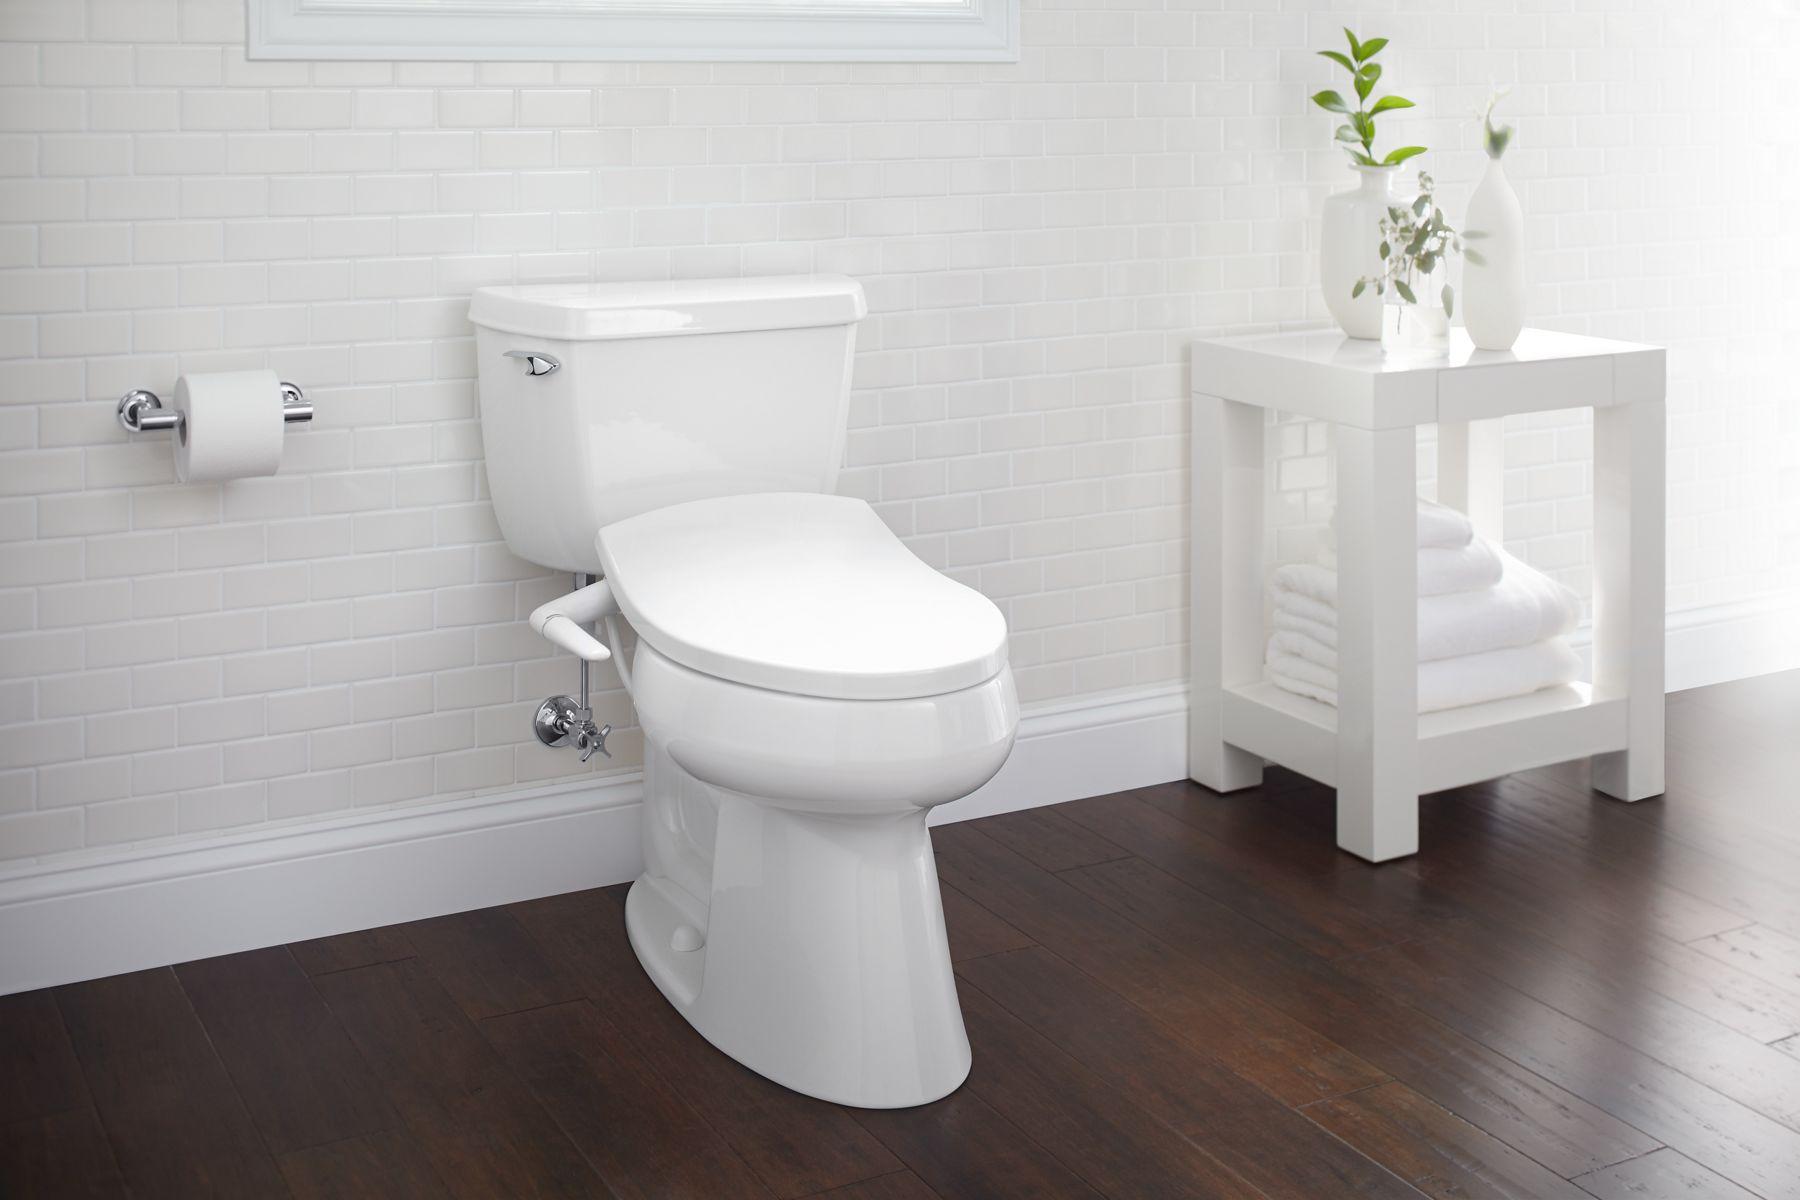 Overview Bidet Toilet Seats Toilets KOHLER